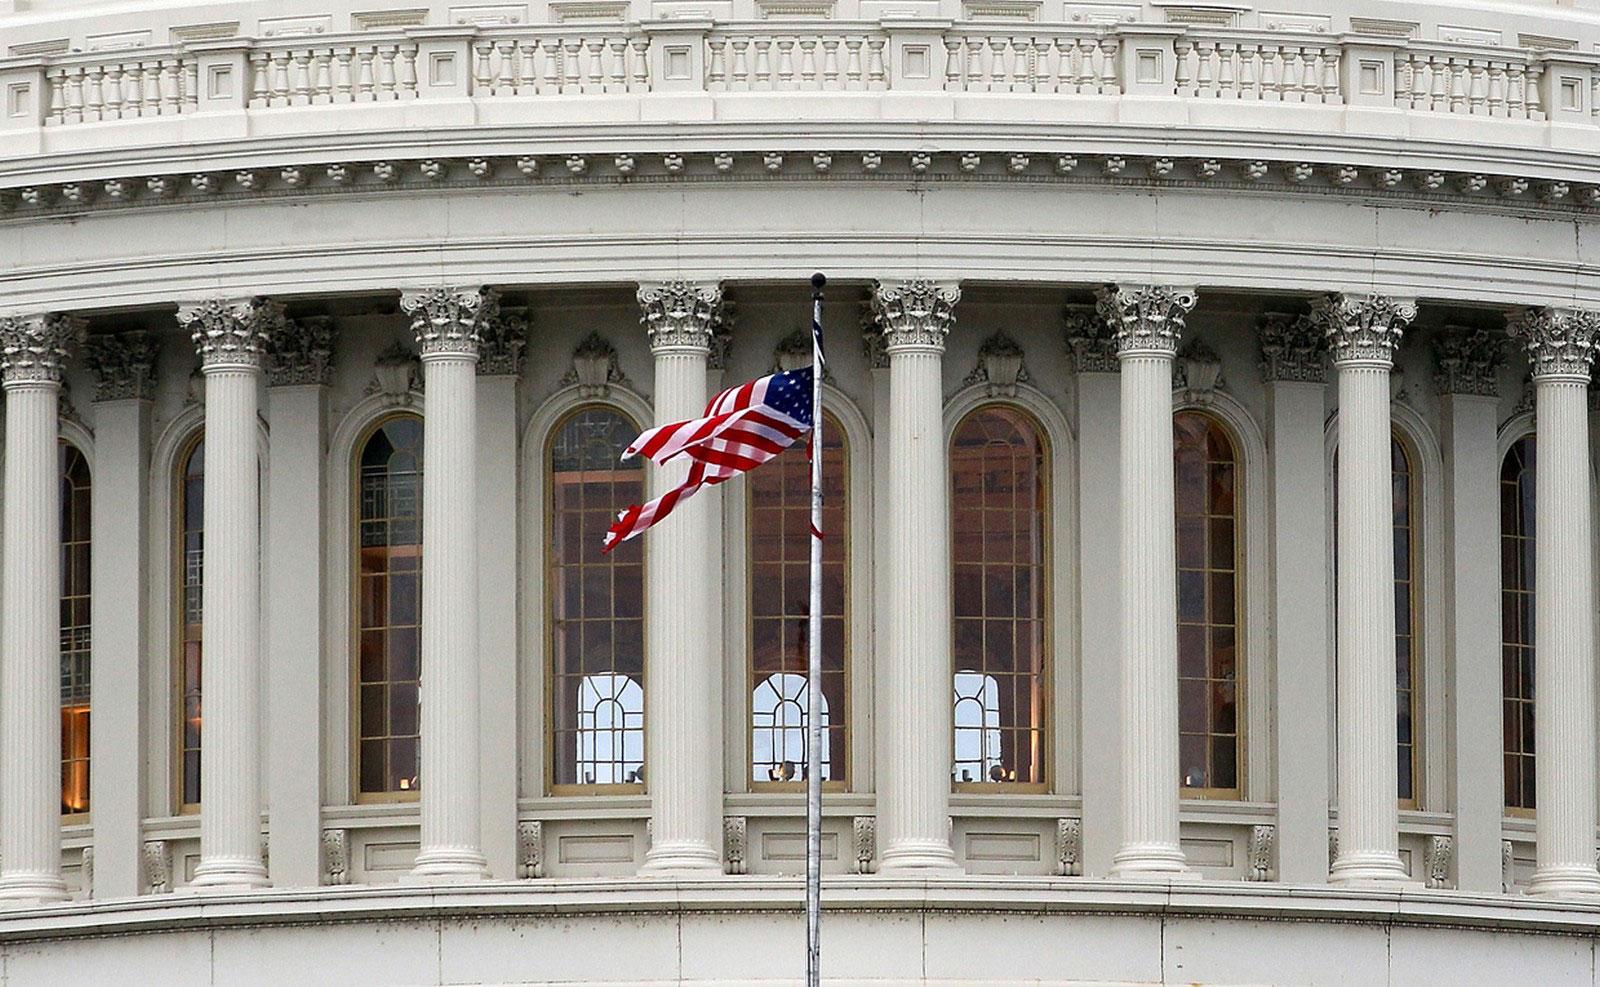 американский флаг над Капитолием